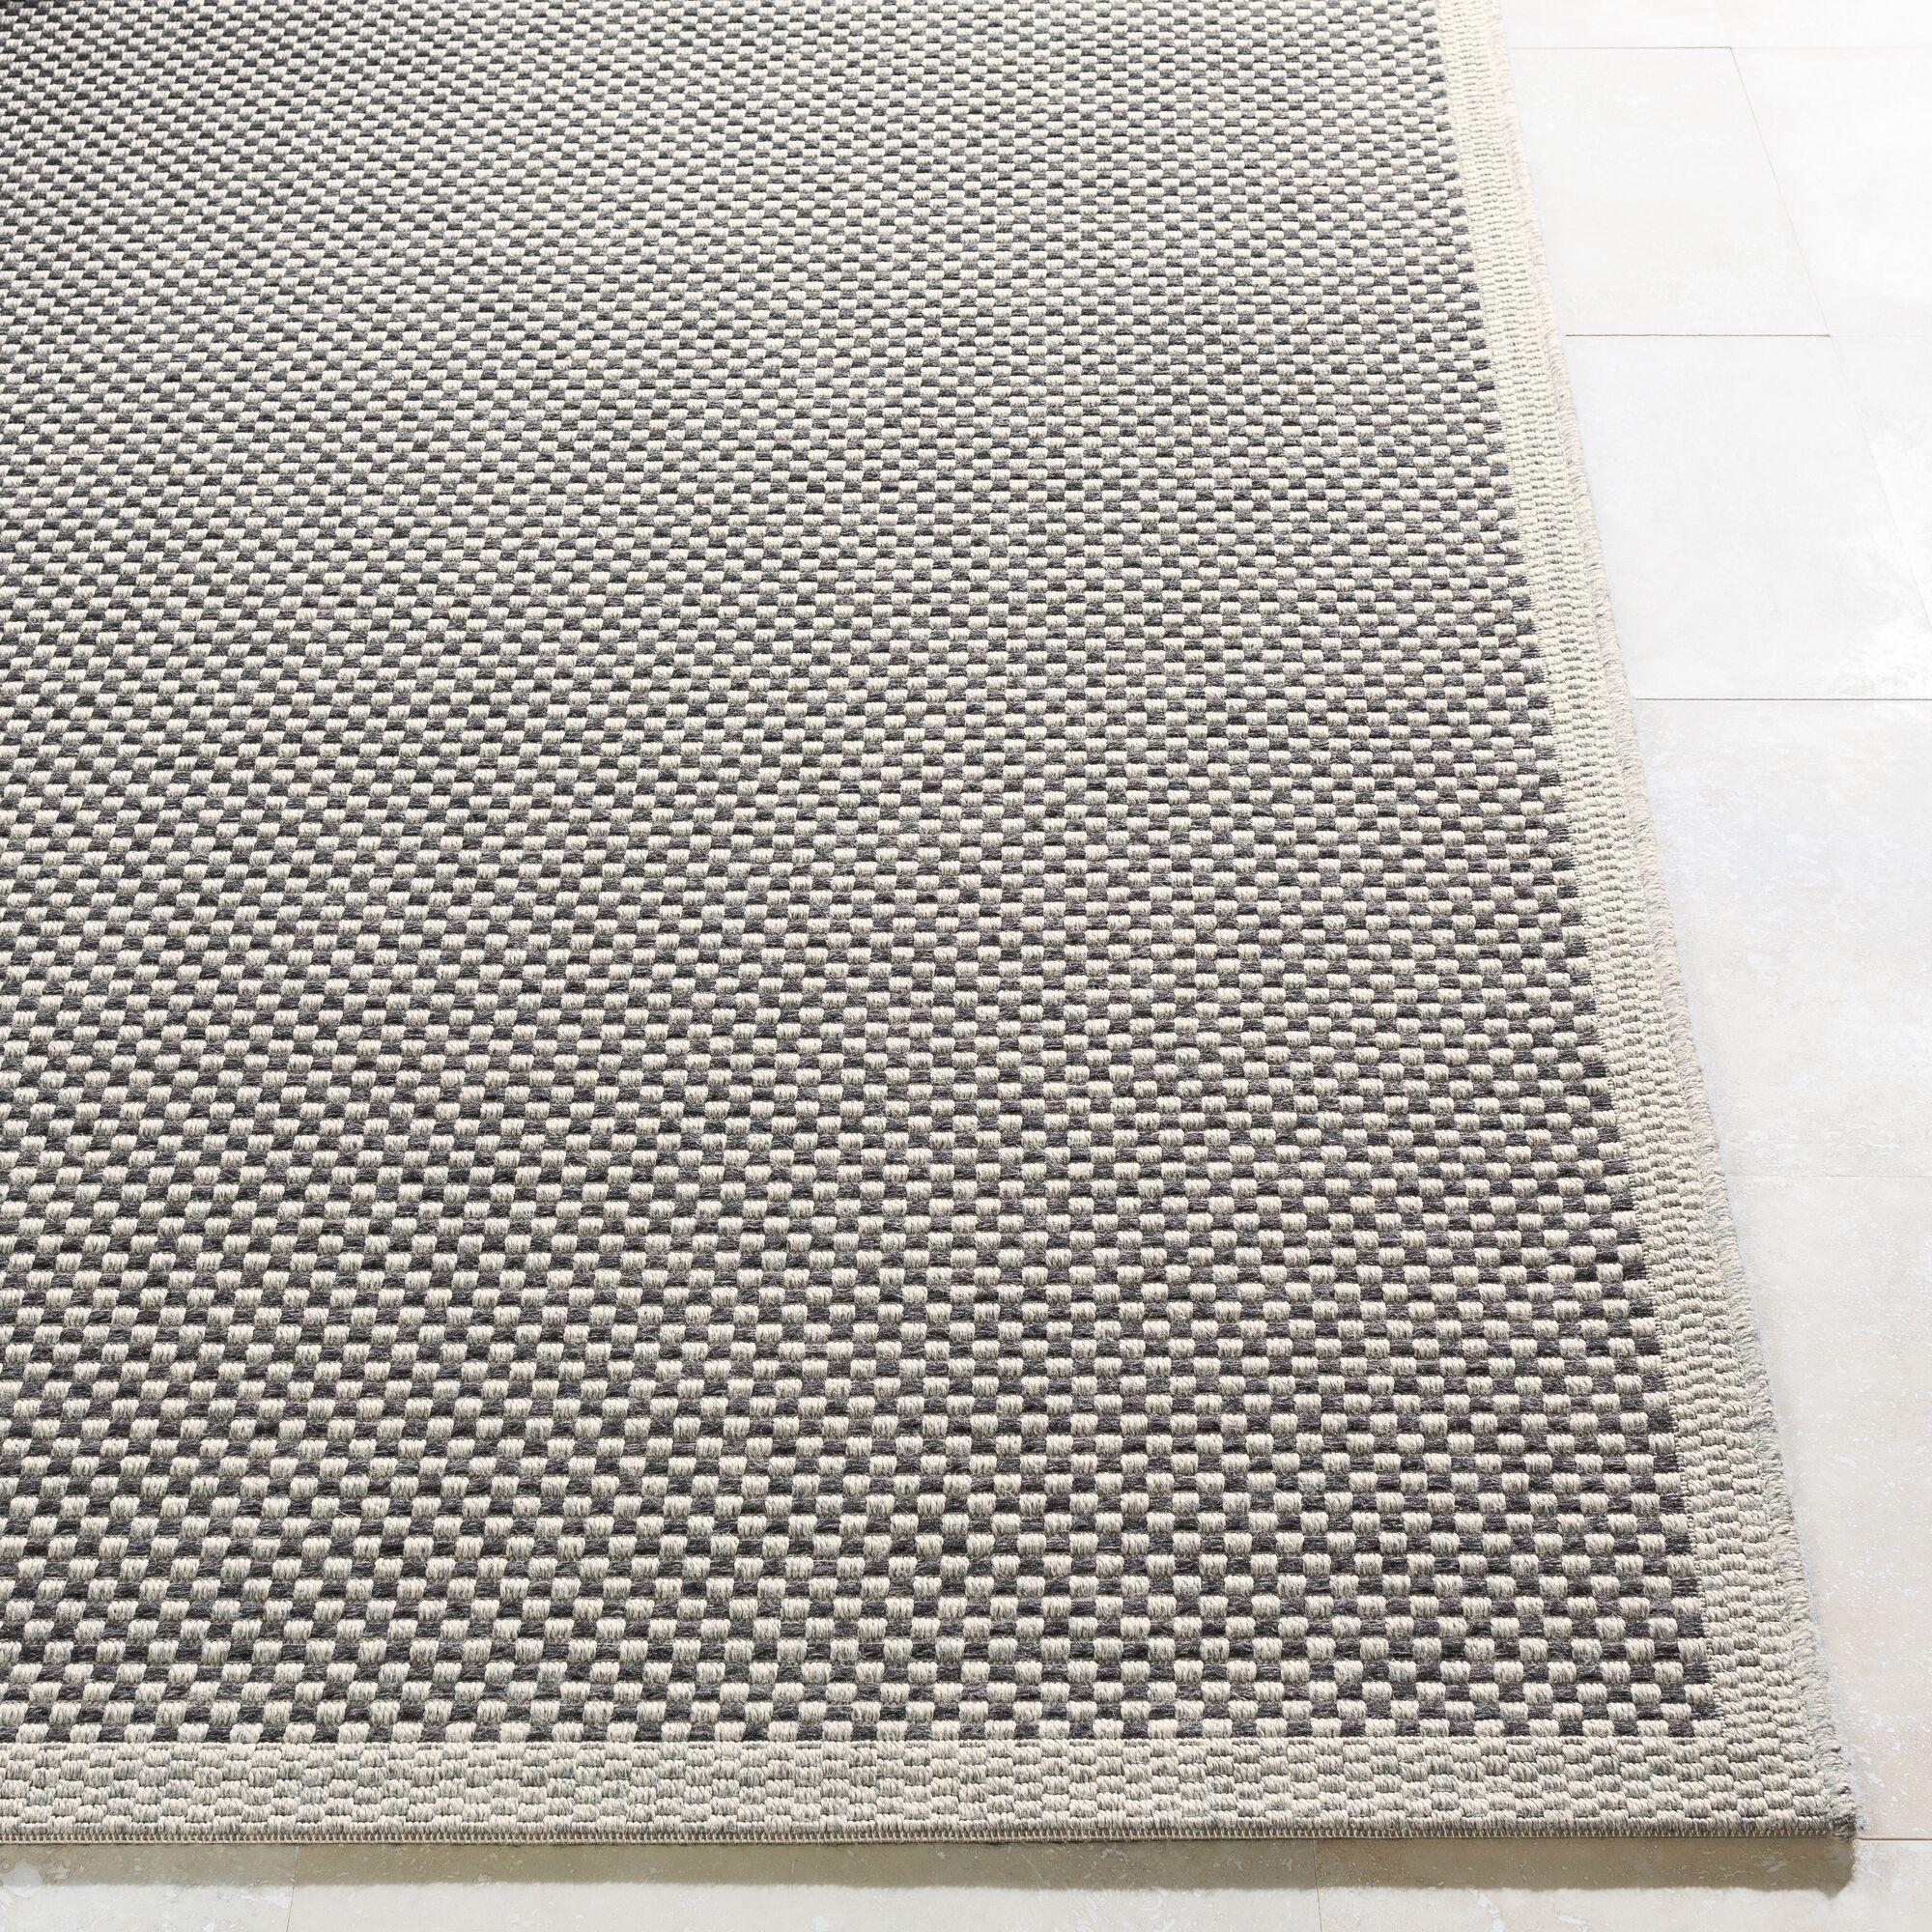 Sarang Light Gray Indoor/Outdoor Area Rug Rug Size: Rectangle 7'10